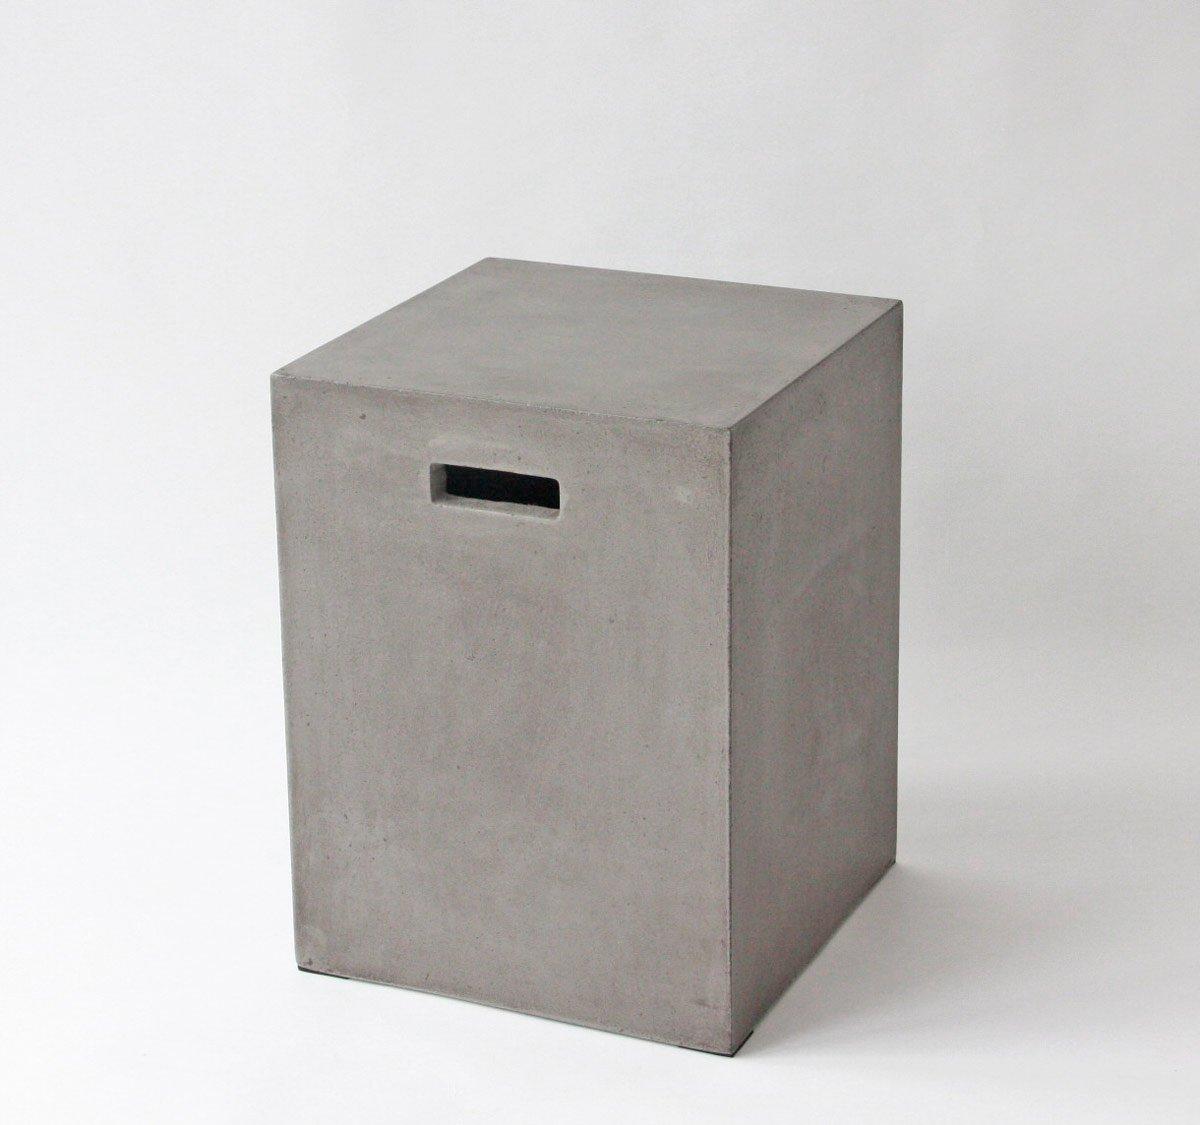 Amazon.de: Betonhocker Betonmöbel Beistelltisch Beton 35 x 35 x 46 ...